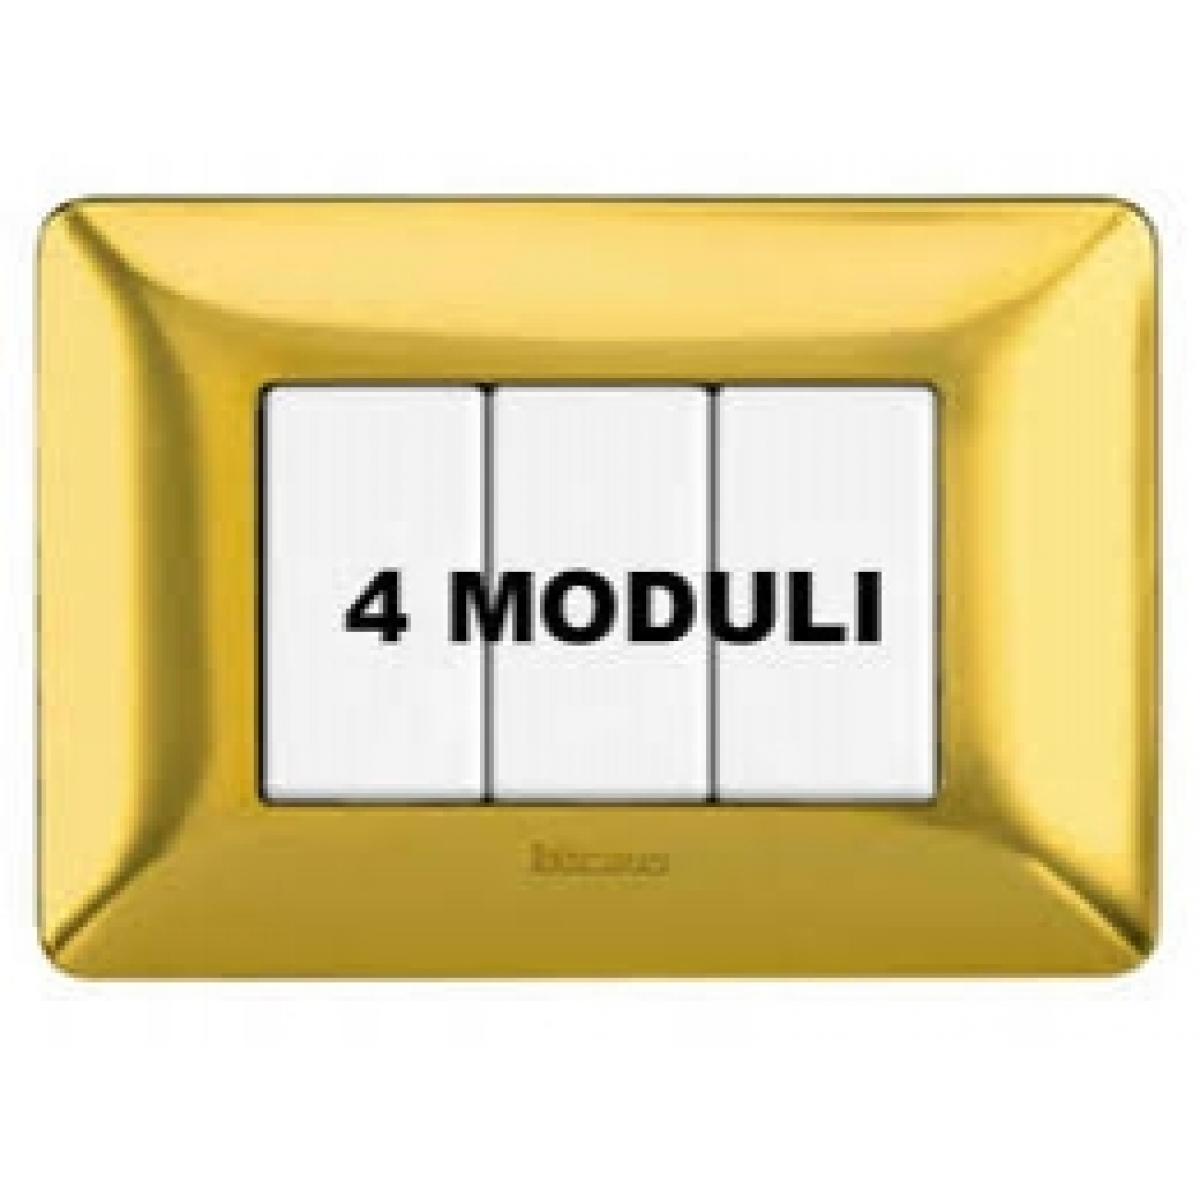 Placca 4 Moduli Oro Lucido Bticino Matix AM4804GOR